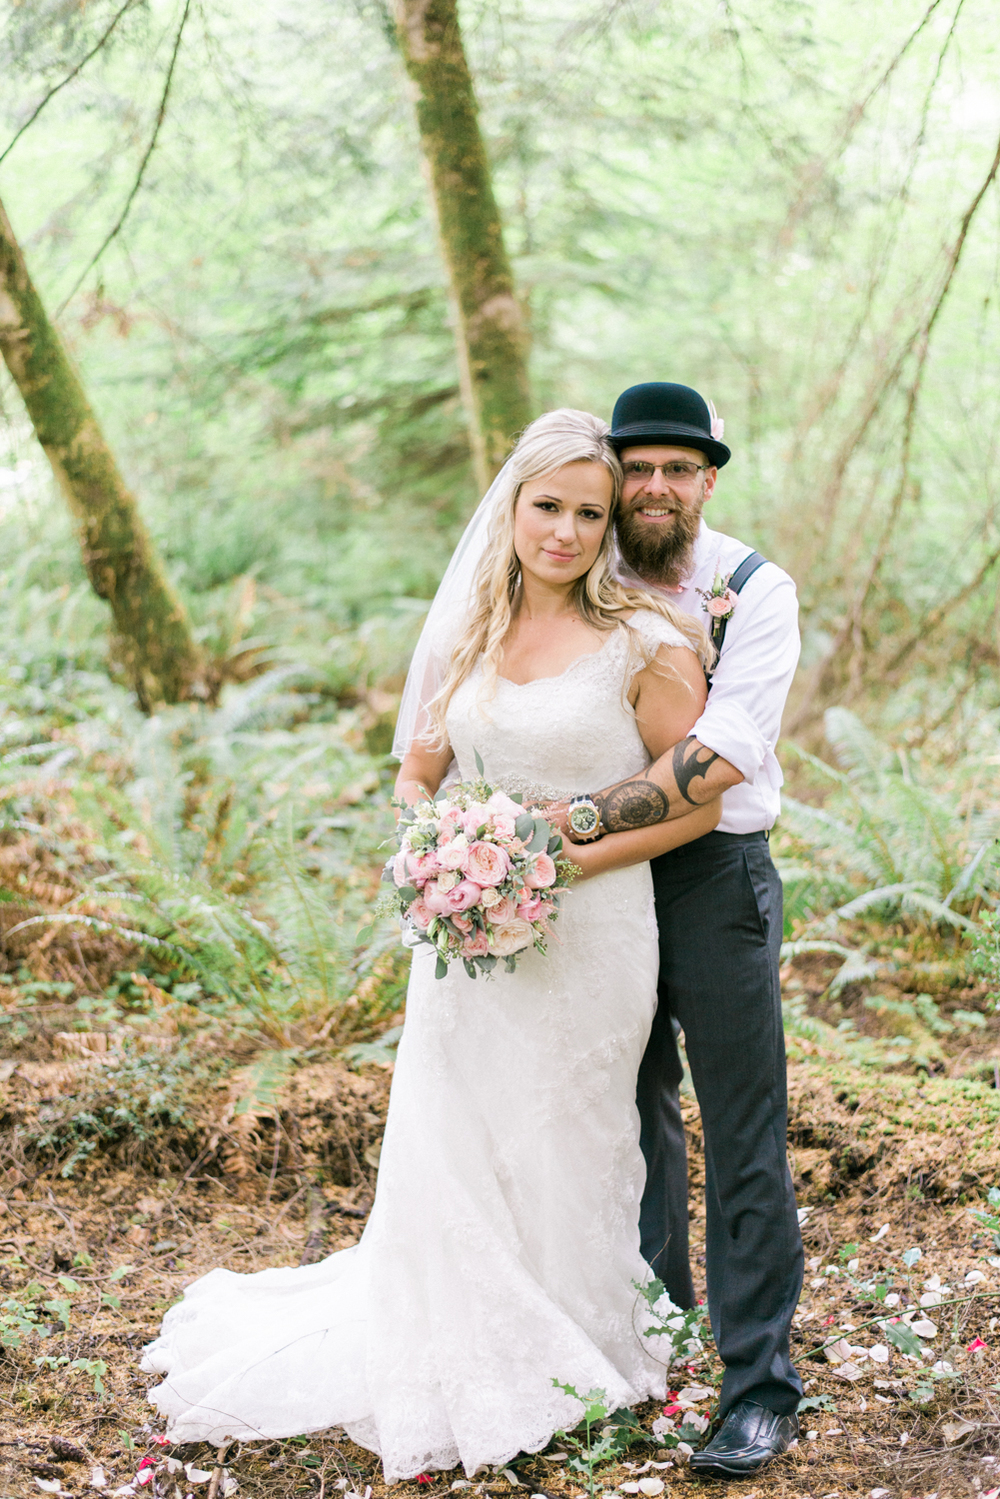 portland-oregon-wedding-DIY-vintage-backyard-rustic-shelley-marie-photo-2